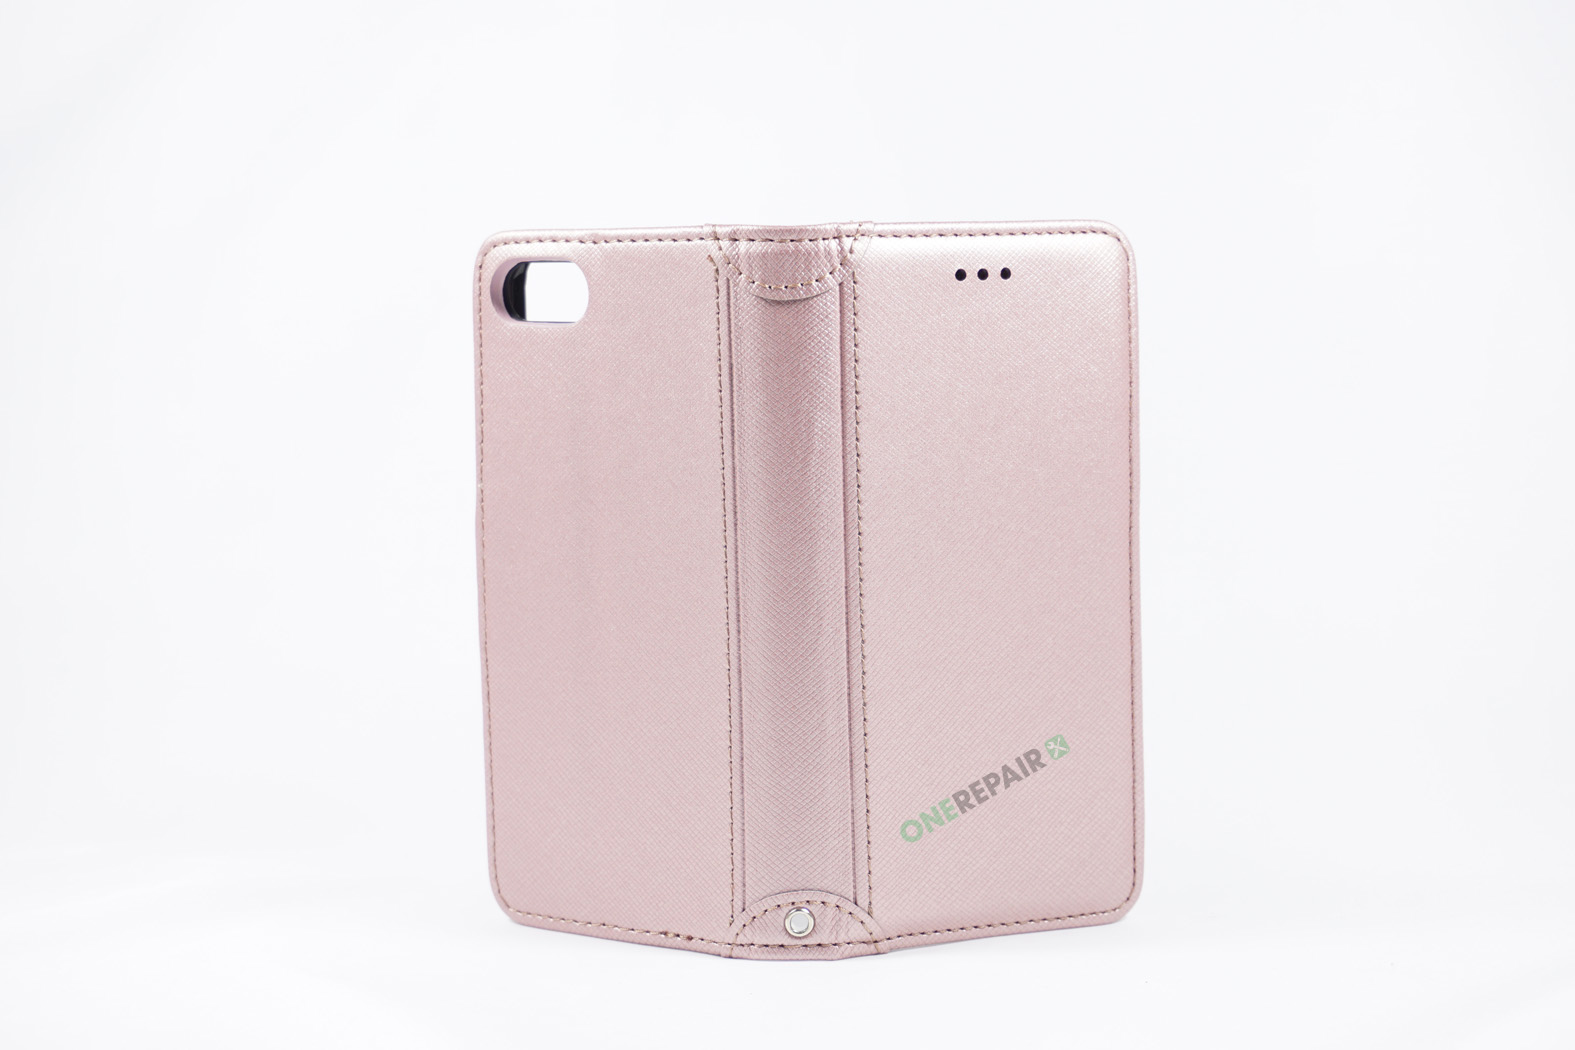 350788_iPhone_7_8_Luxury_Flipcover_Cover_Lyseroed_Pink_OneRepair_WM_00003